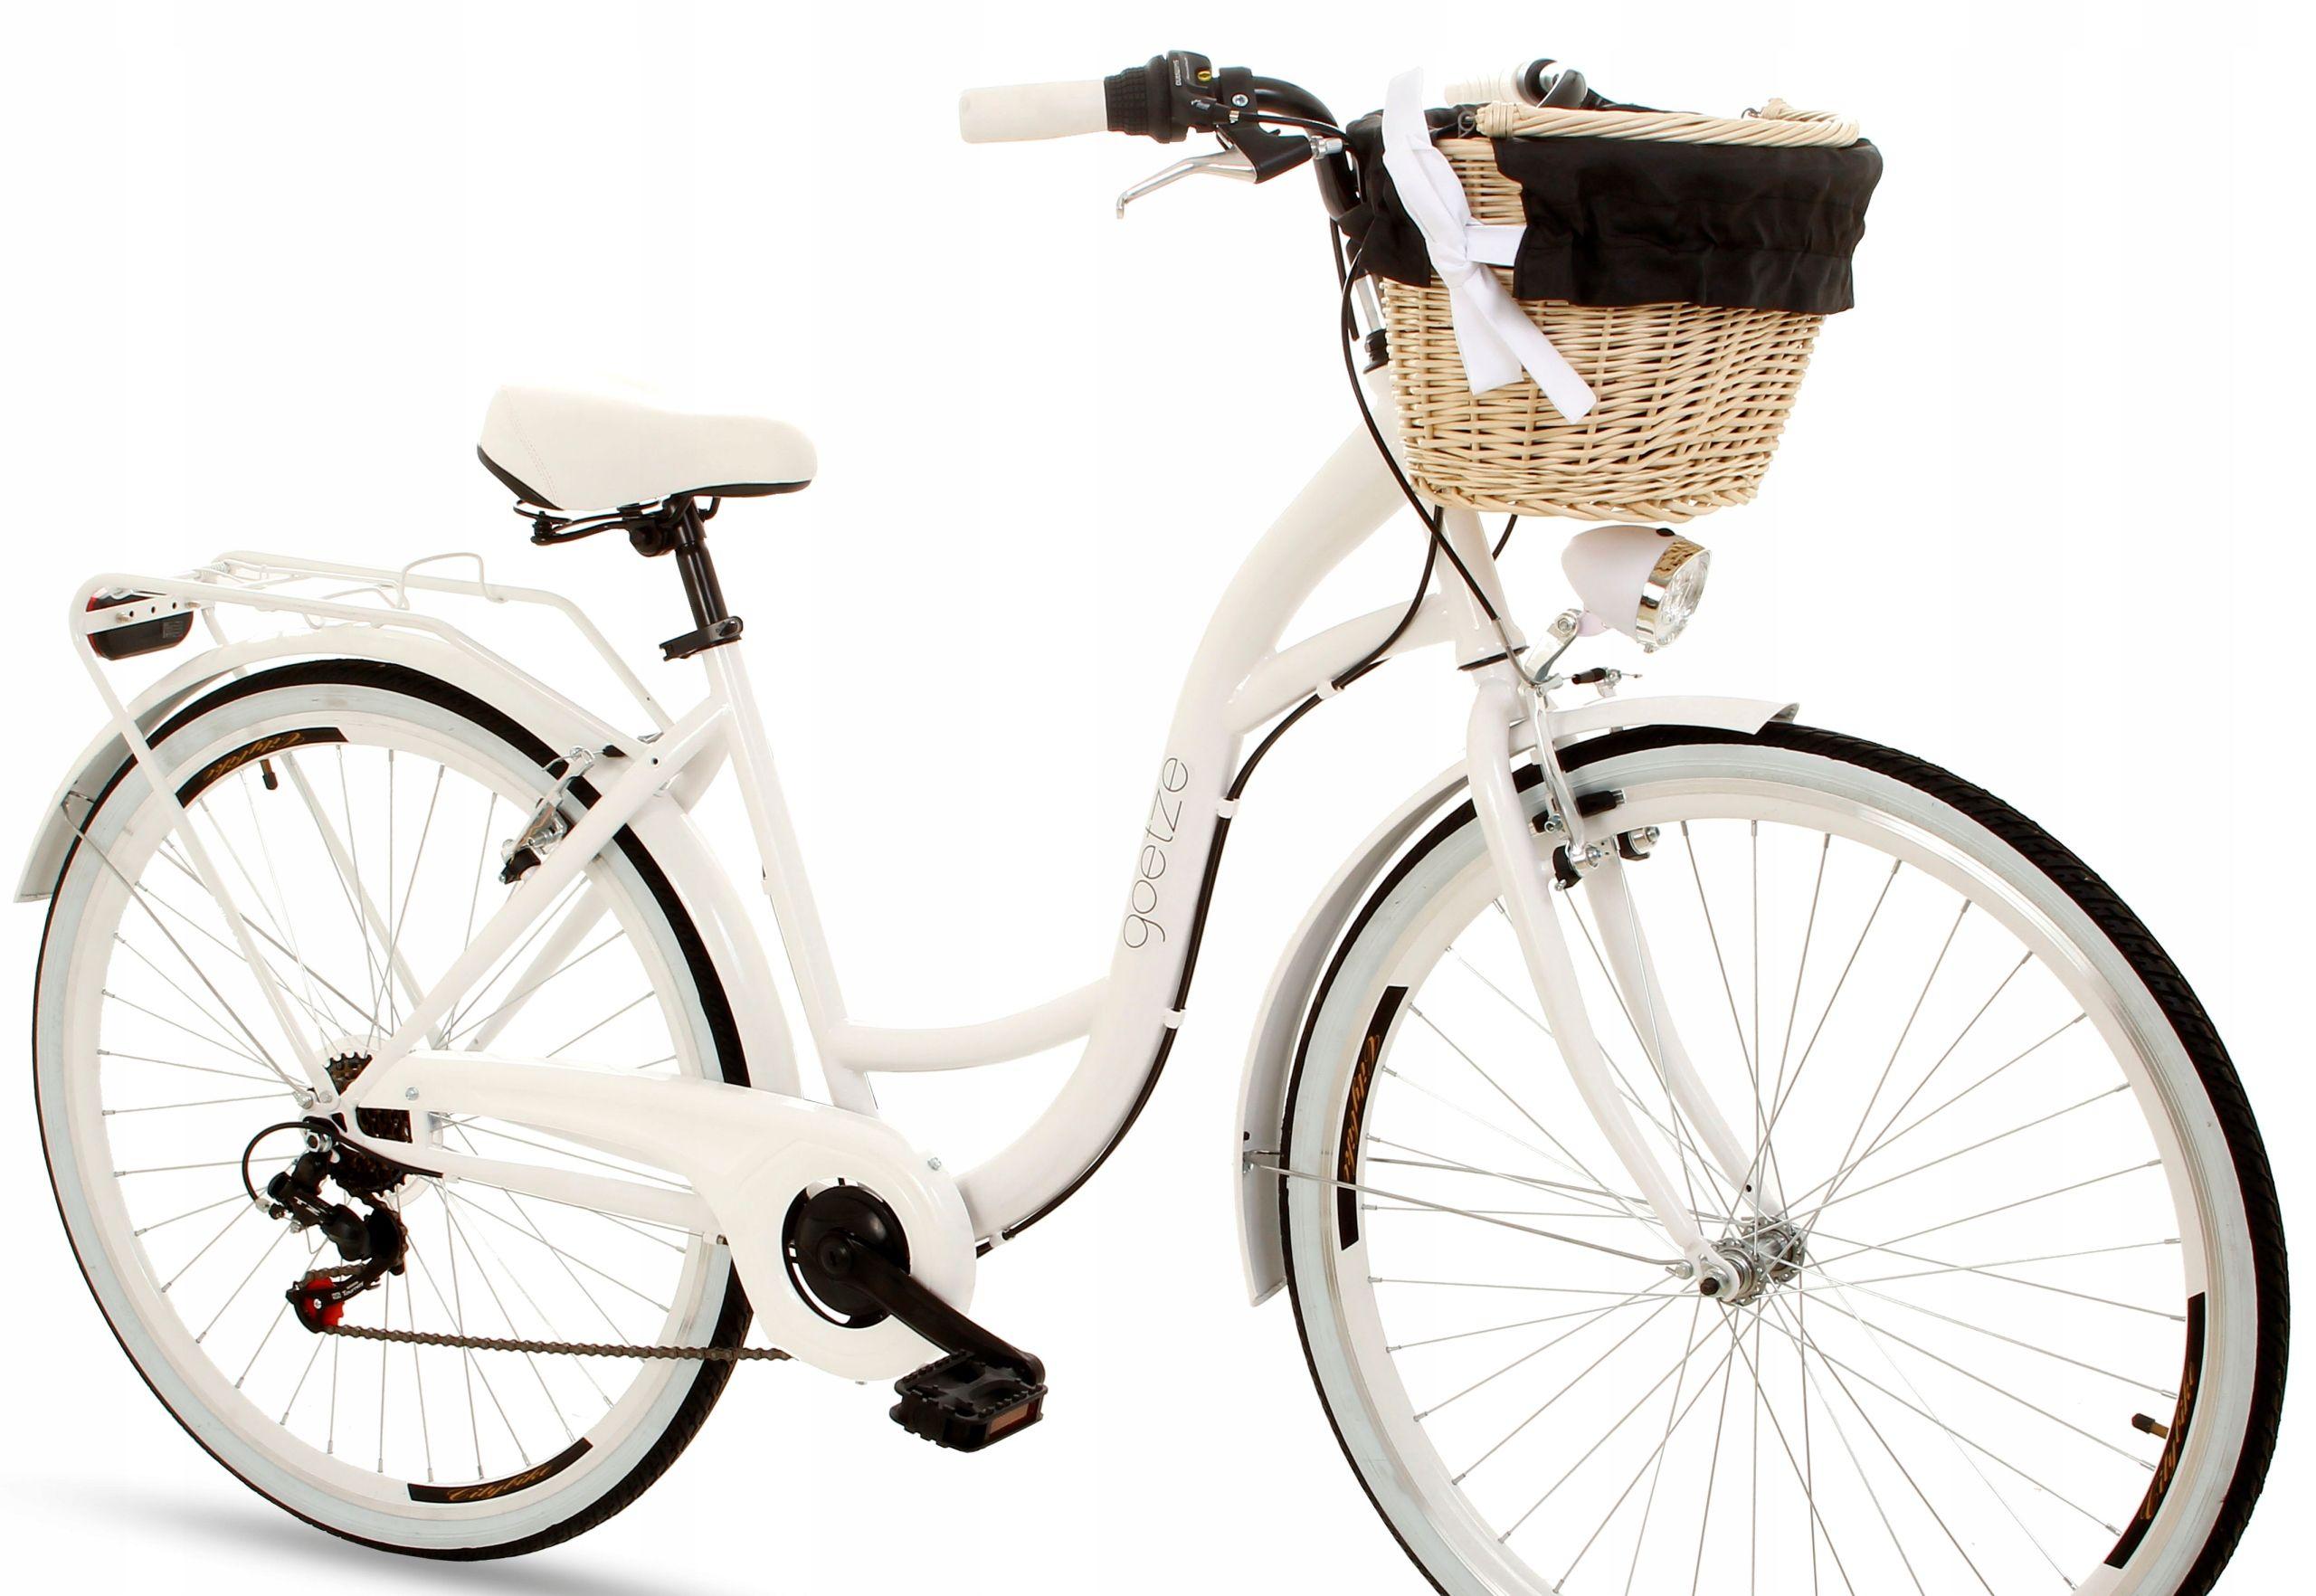 Damski Rower Miejski 28 Lekki Damka 7 Shimano Kosz Polish Clothing Shopping Outfit Online Grocery Shopping